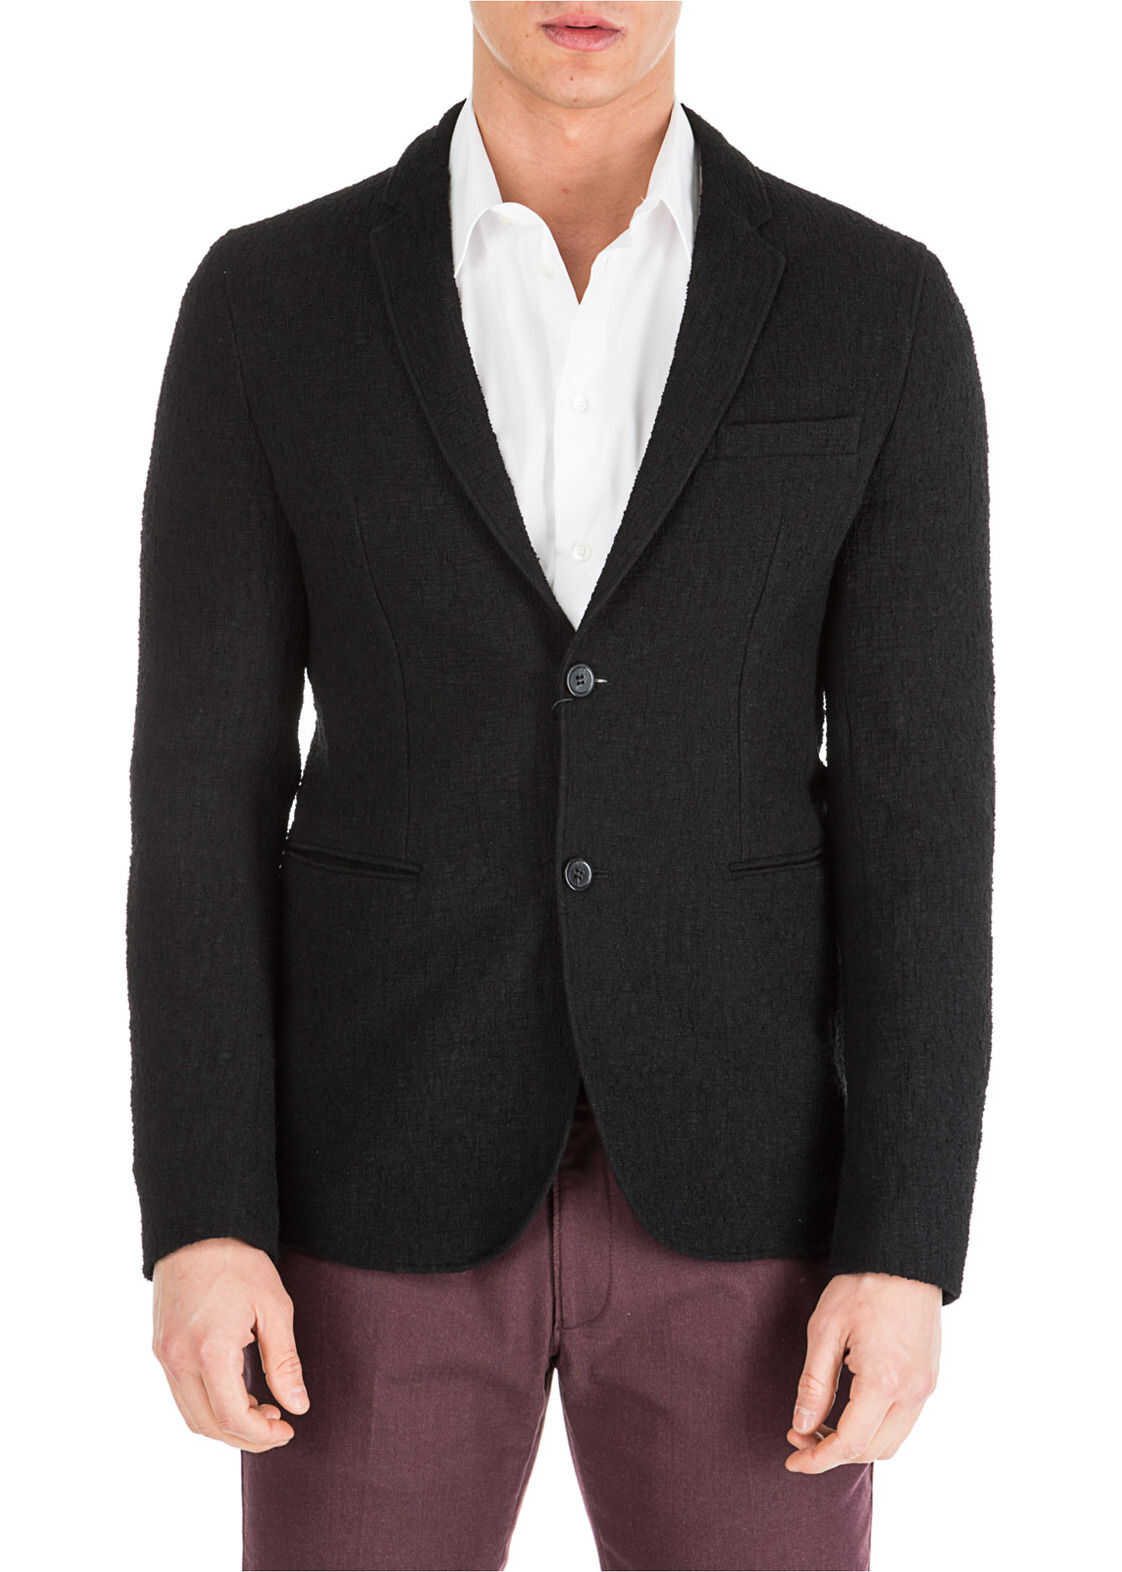 Emporio Armani Jacket Blazer Black